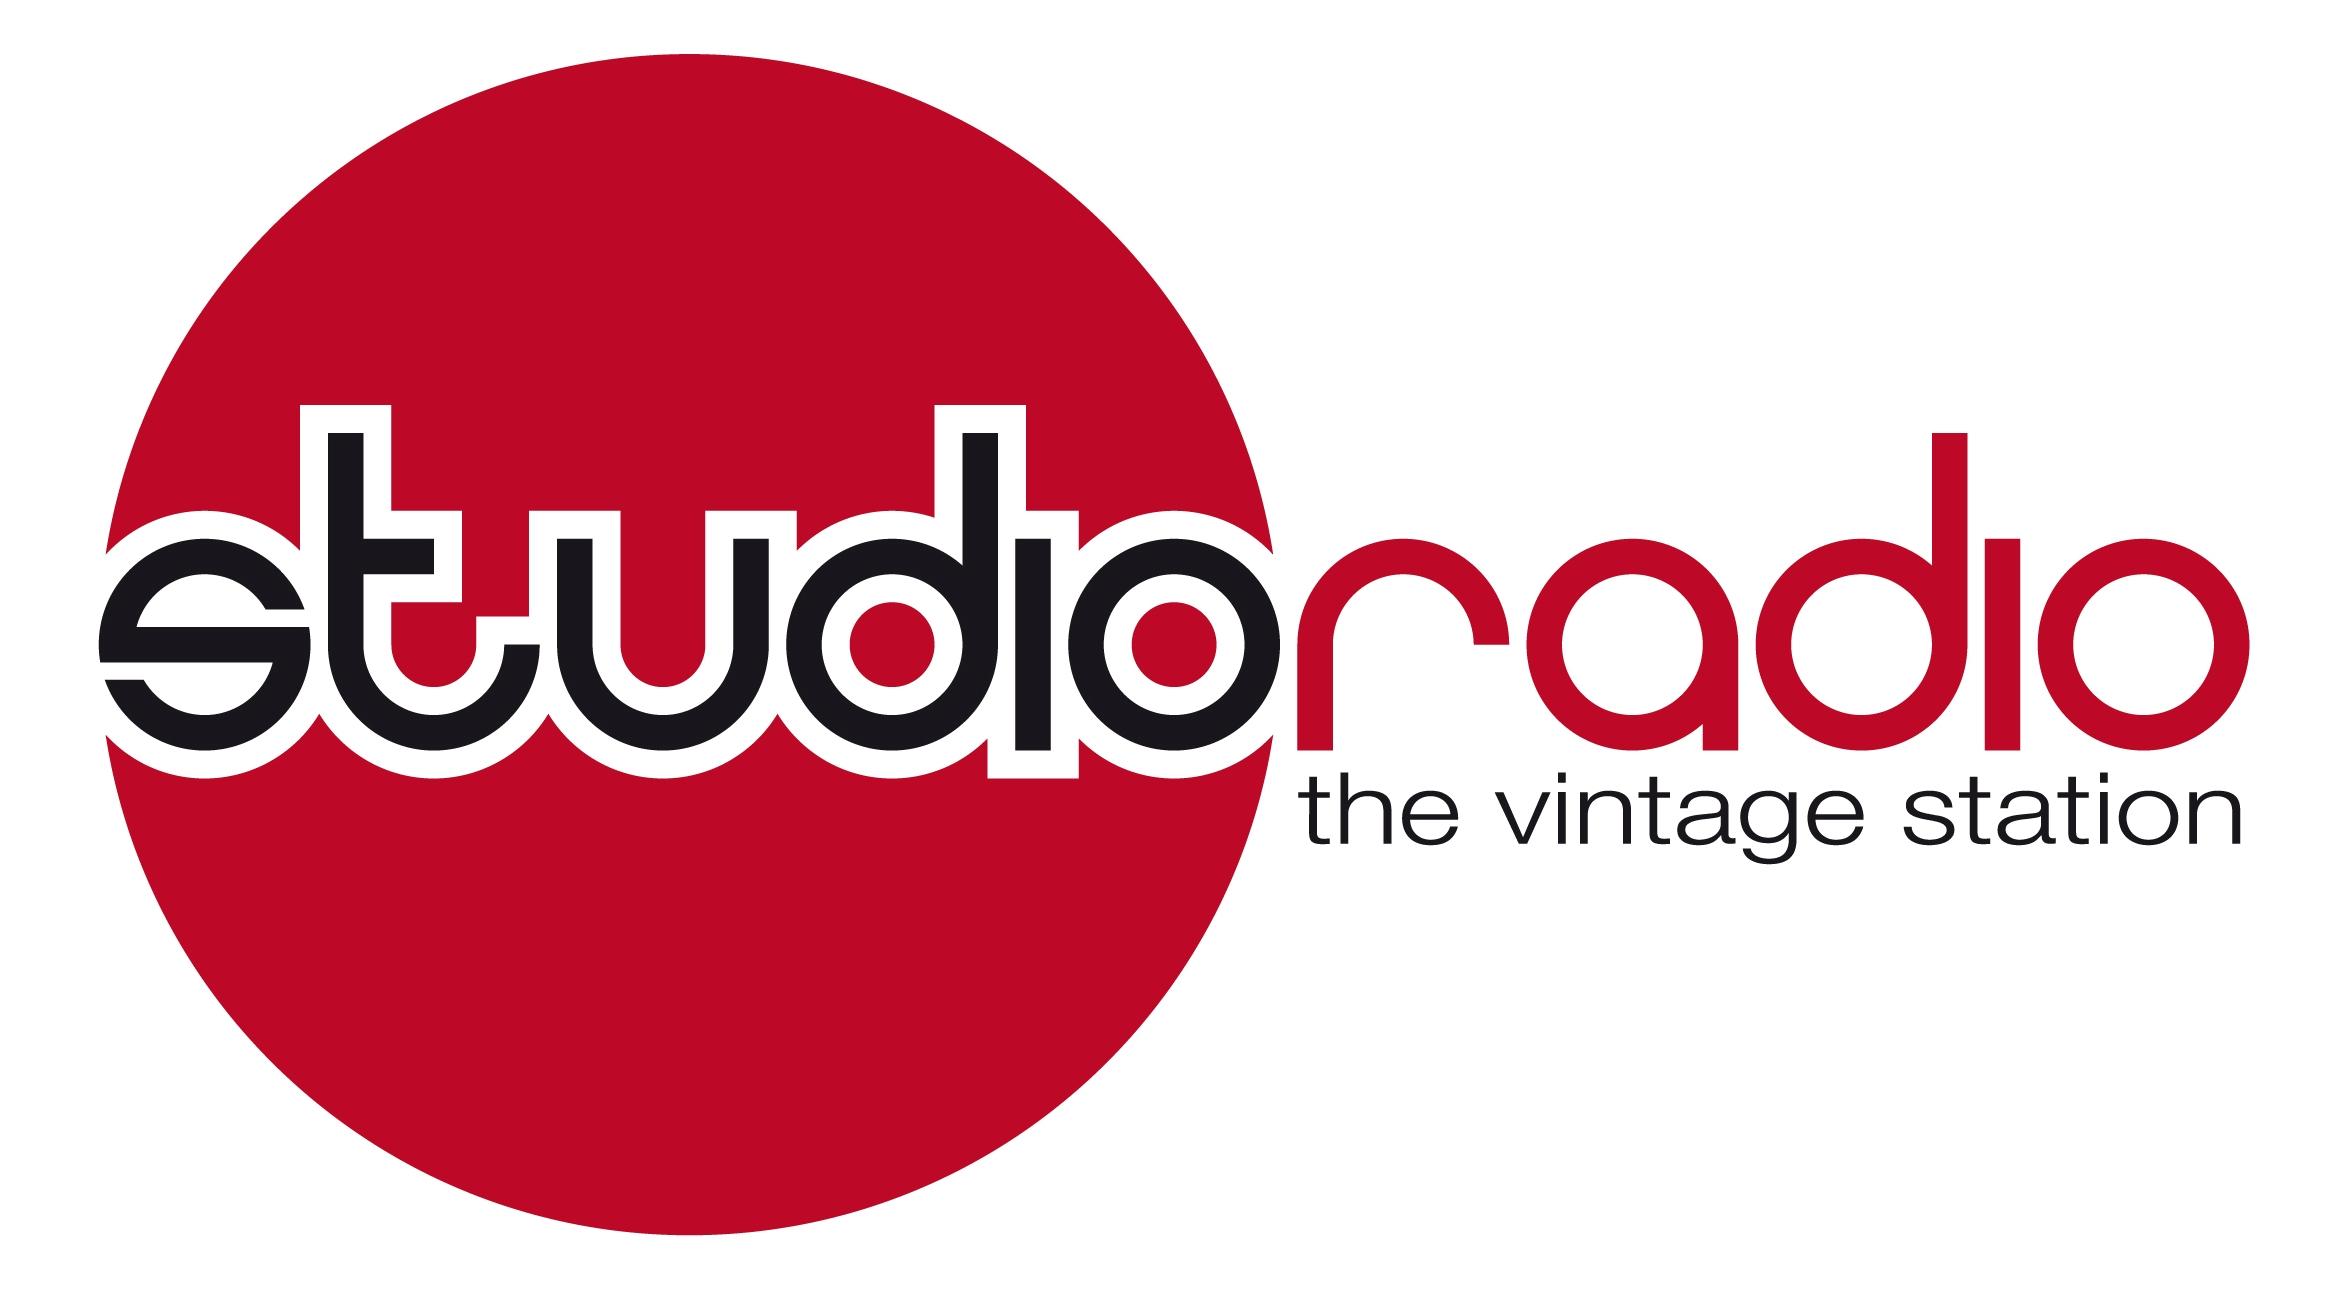 Studioradio the vintage station